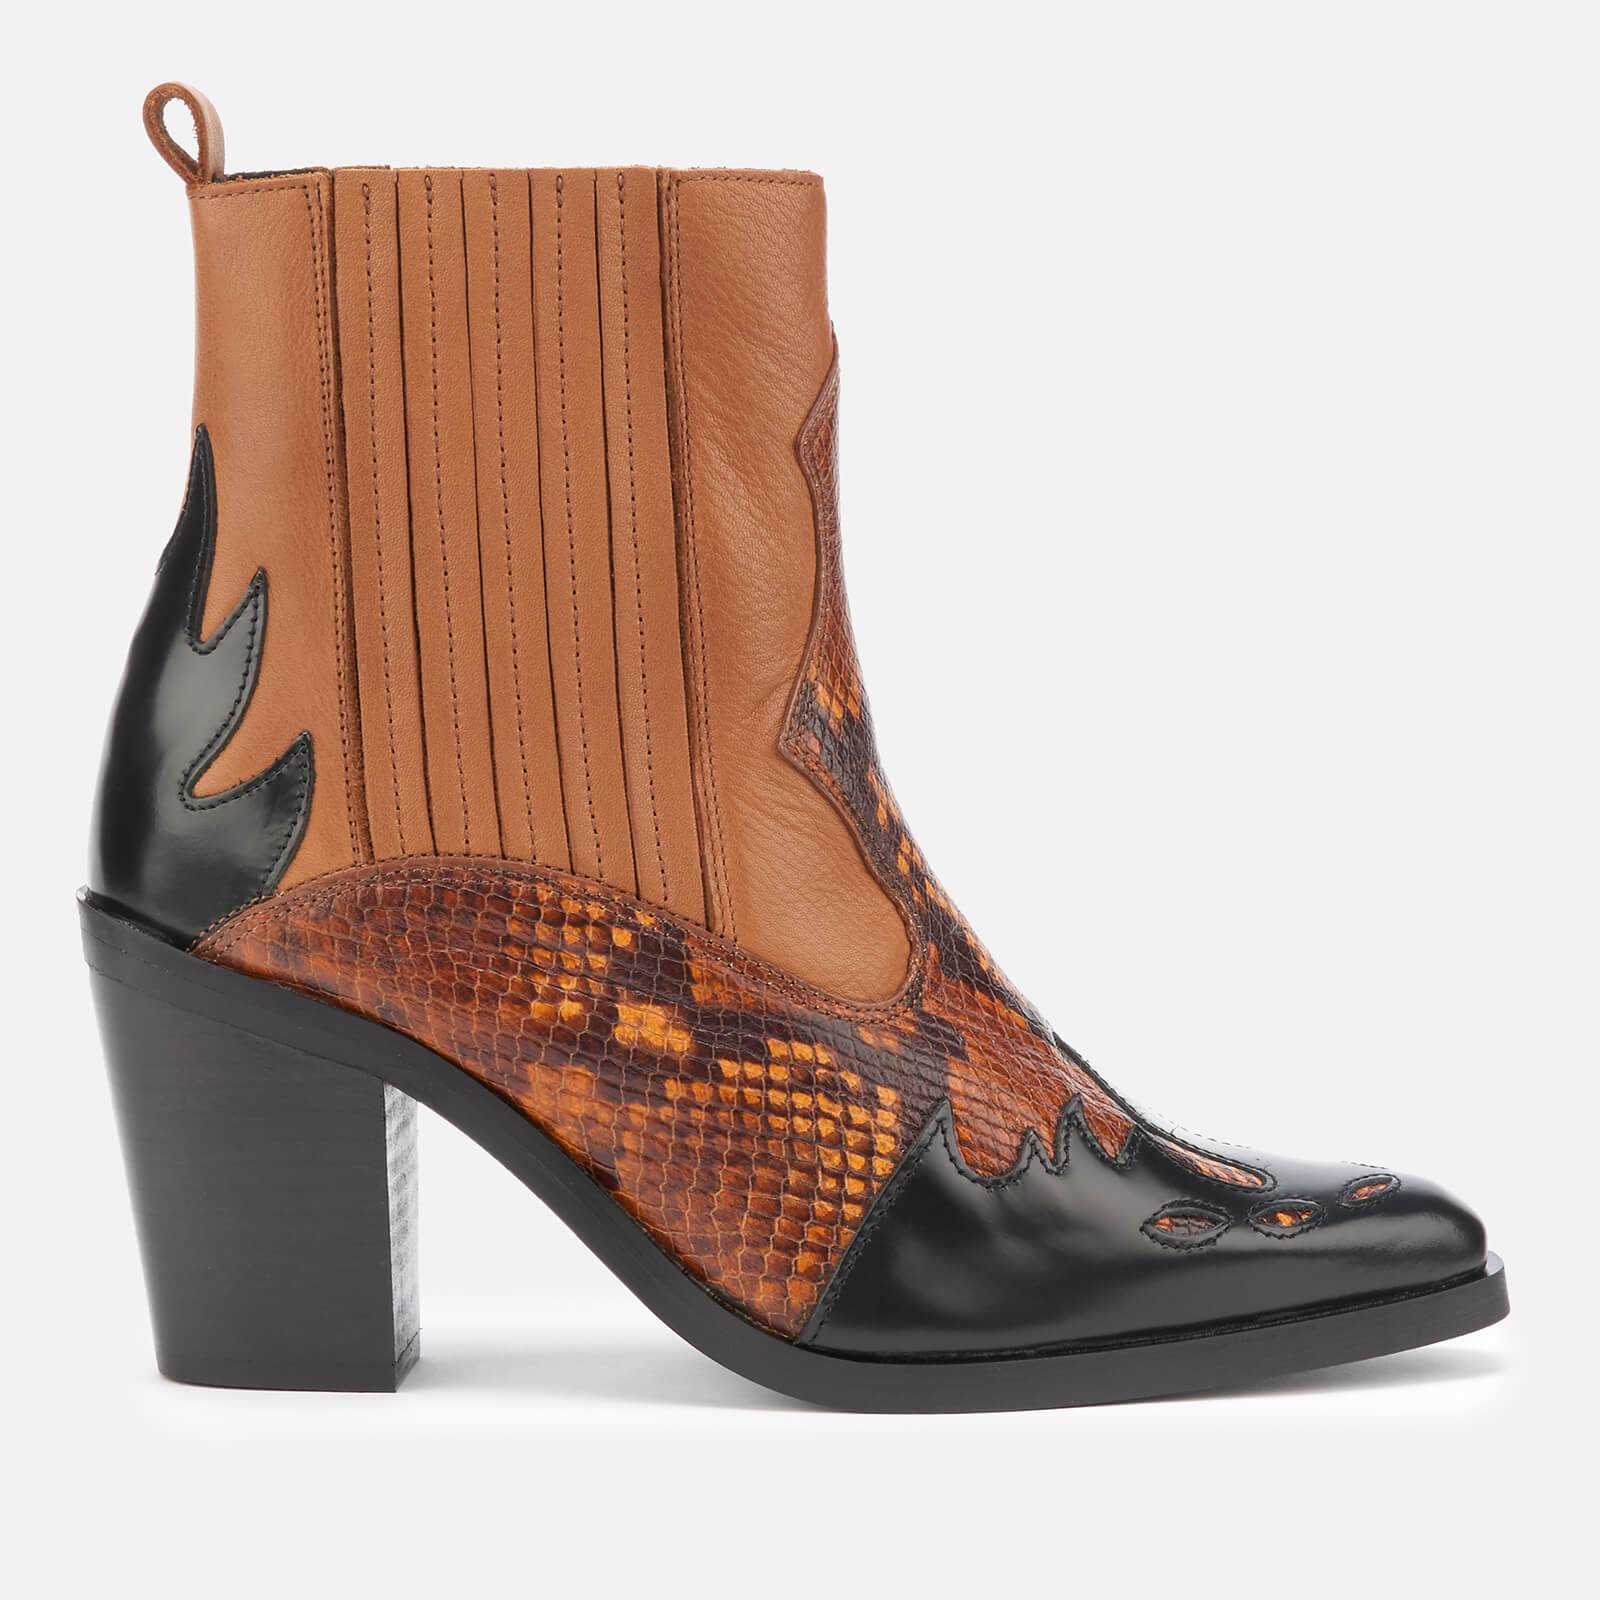 Kurt Geiger London Women's Damen Leather Western Style Boots - Tan Comb - UK 5